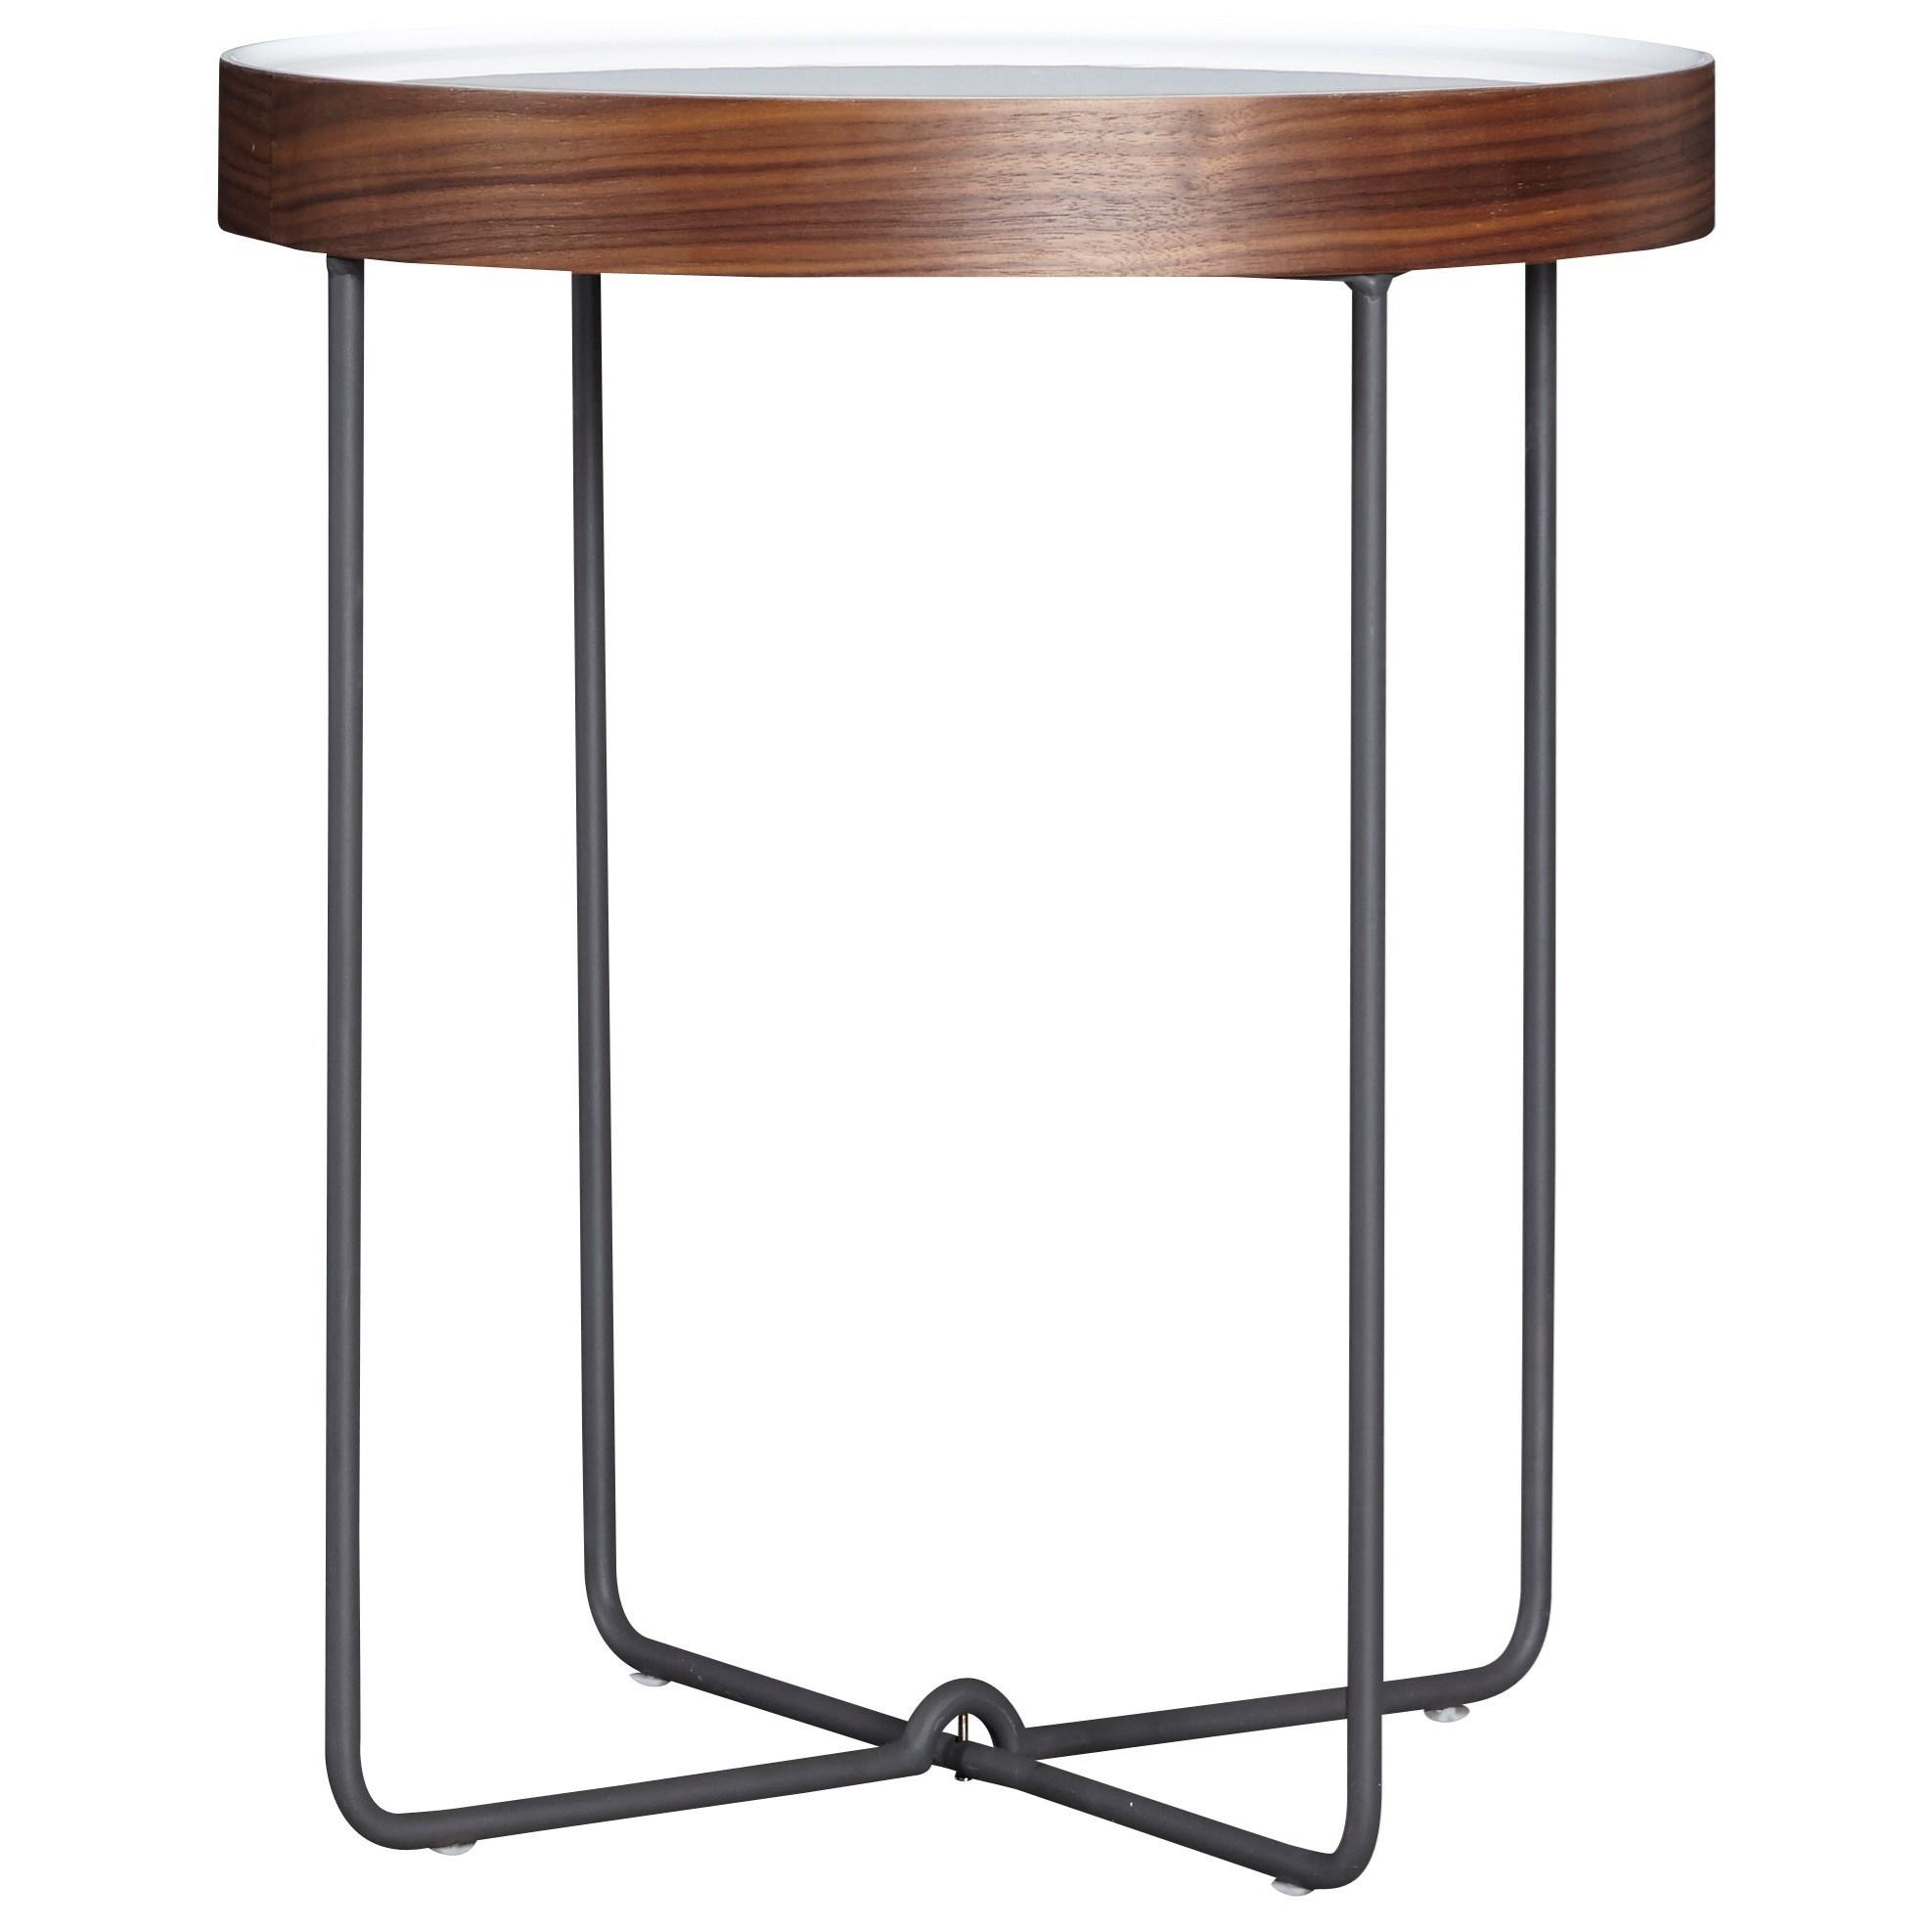 874 Natalie End Table by Casana at Corner Furniture